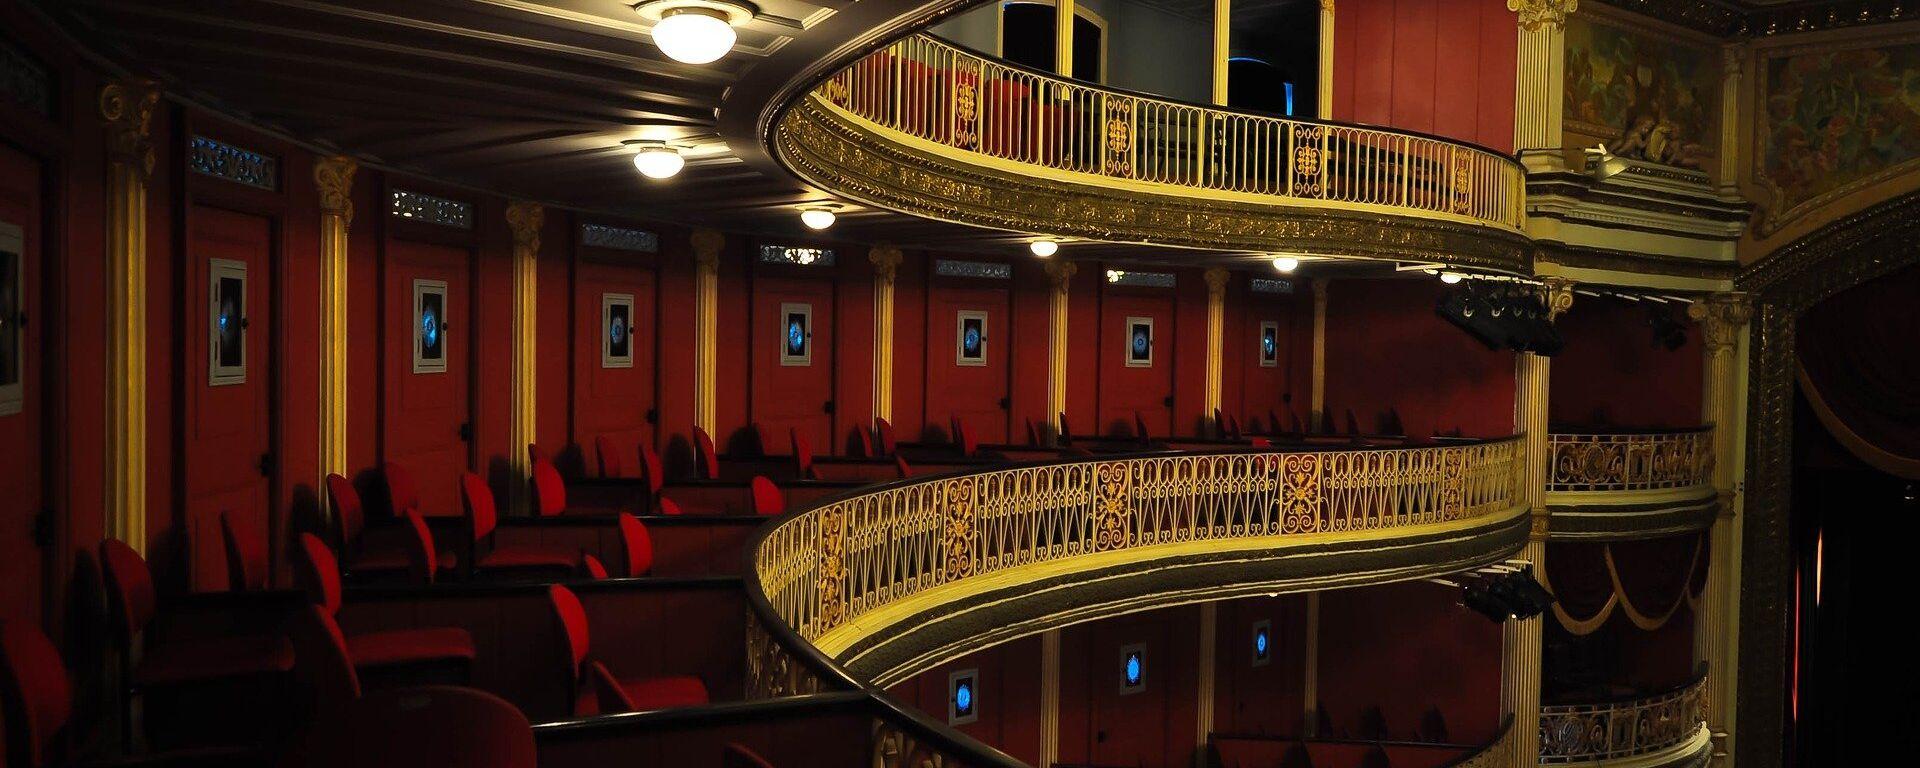 Teatro, imagen referencial - Sputnik Mundo, 1920, 14.04.2021